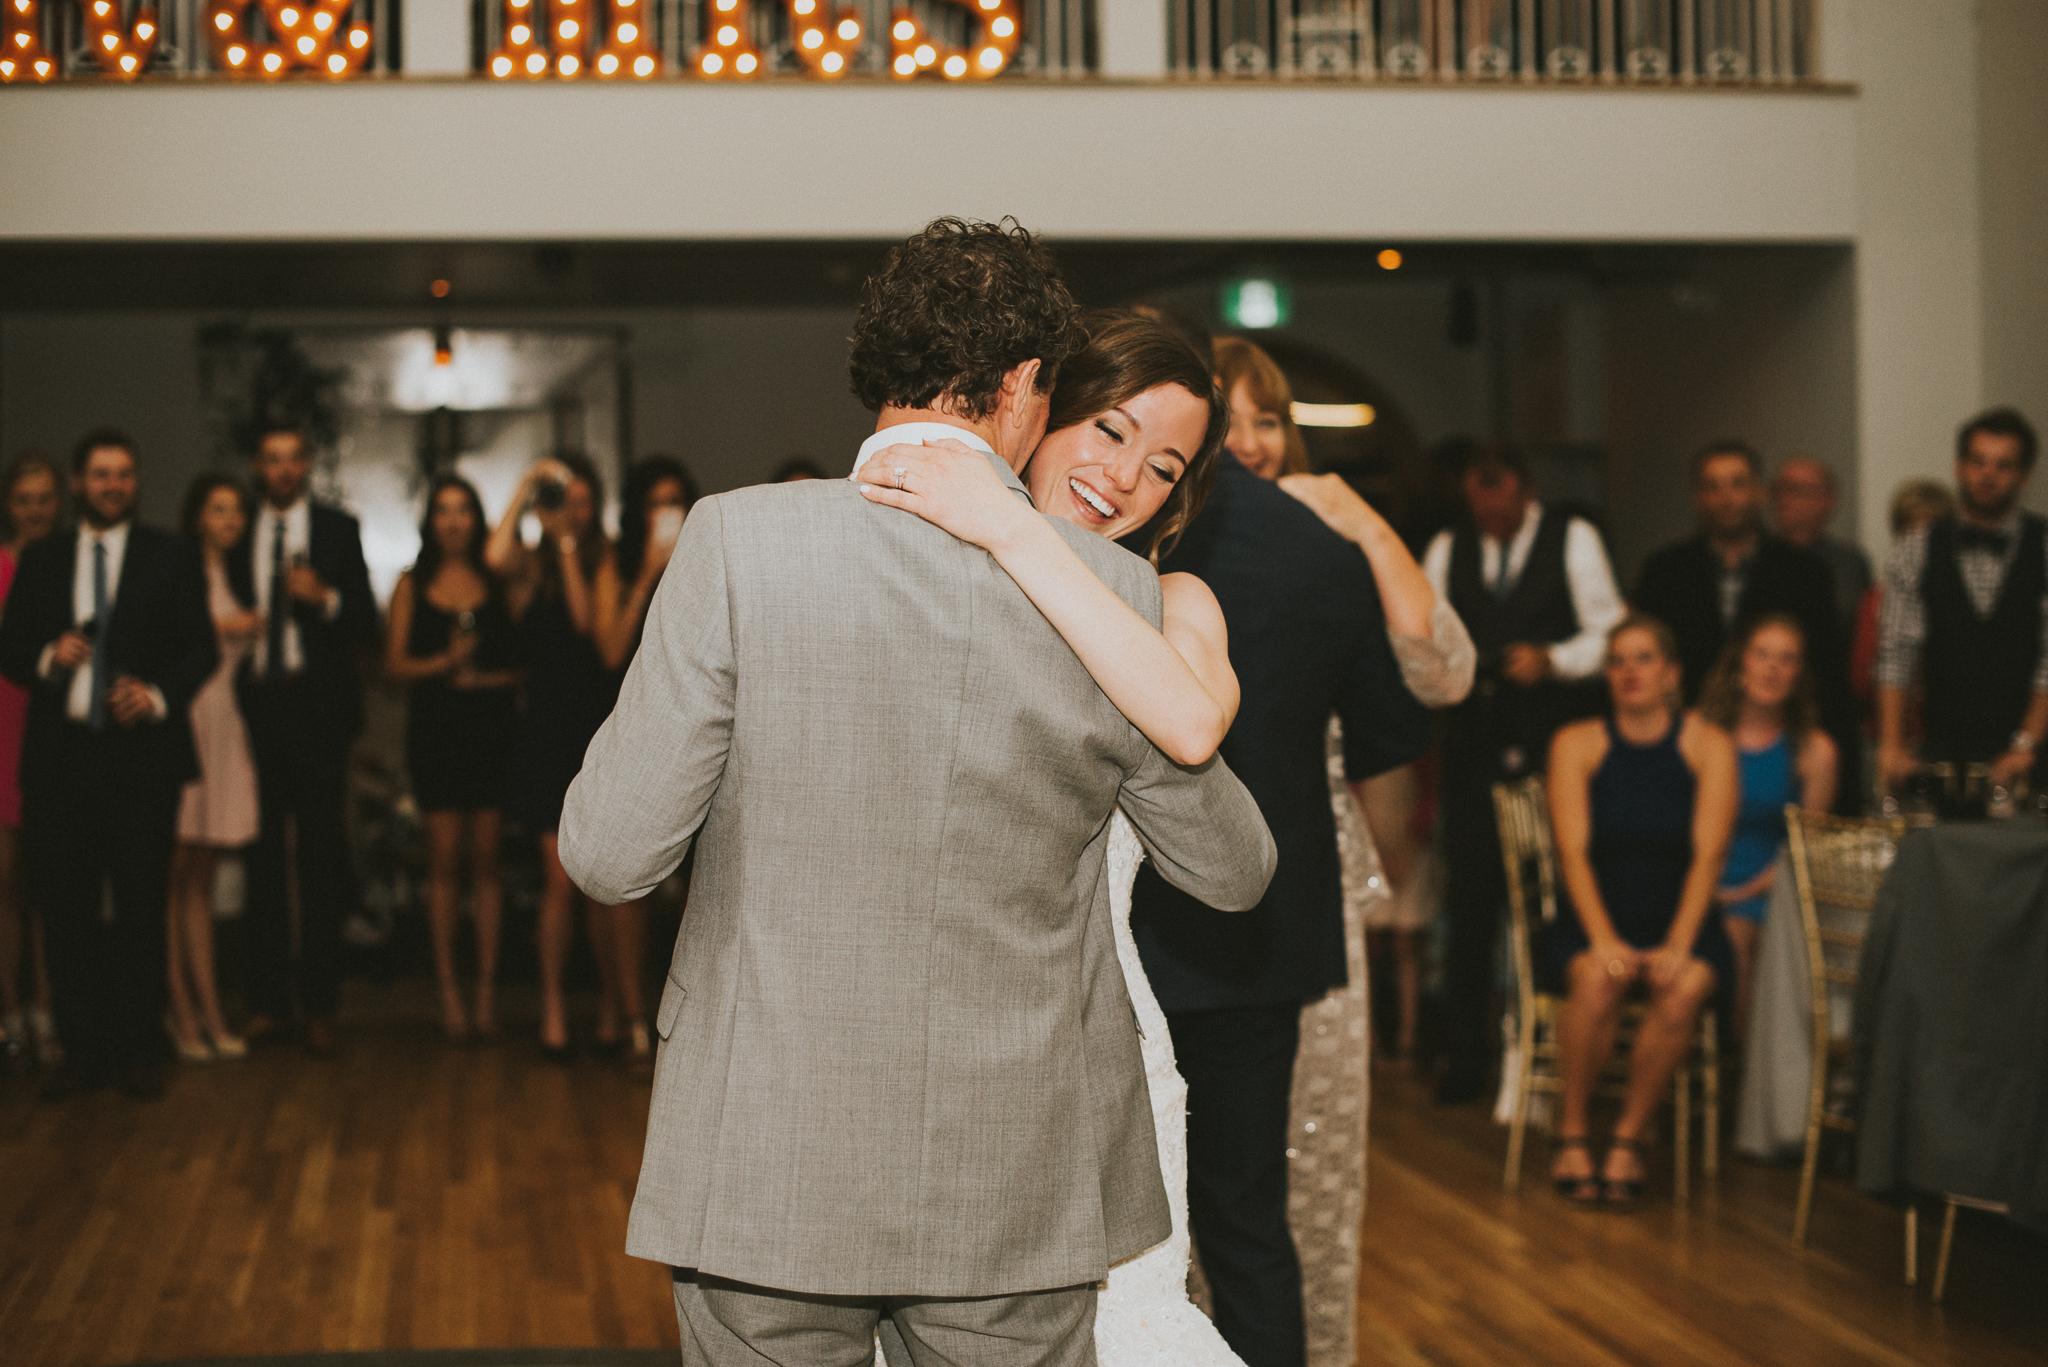 248-permanent-vancouver-wedding-courtneysteven-web-9536.jpg